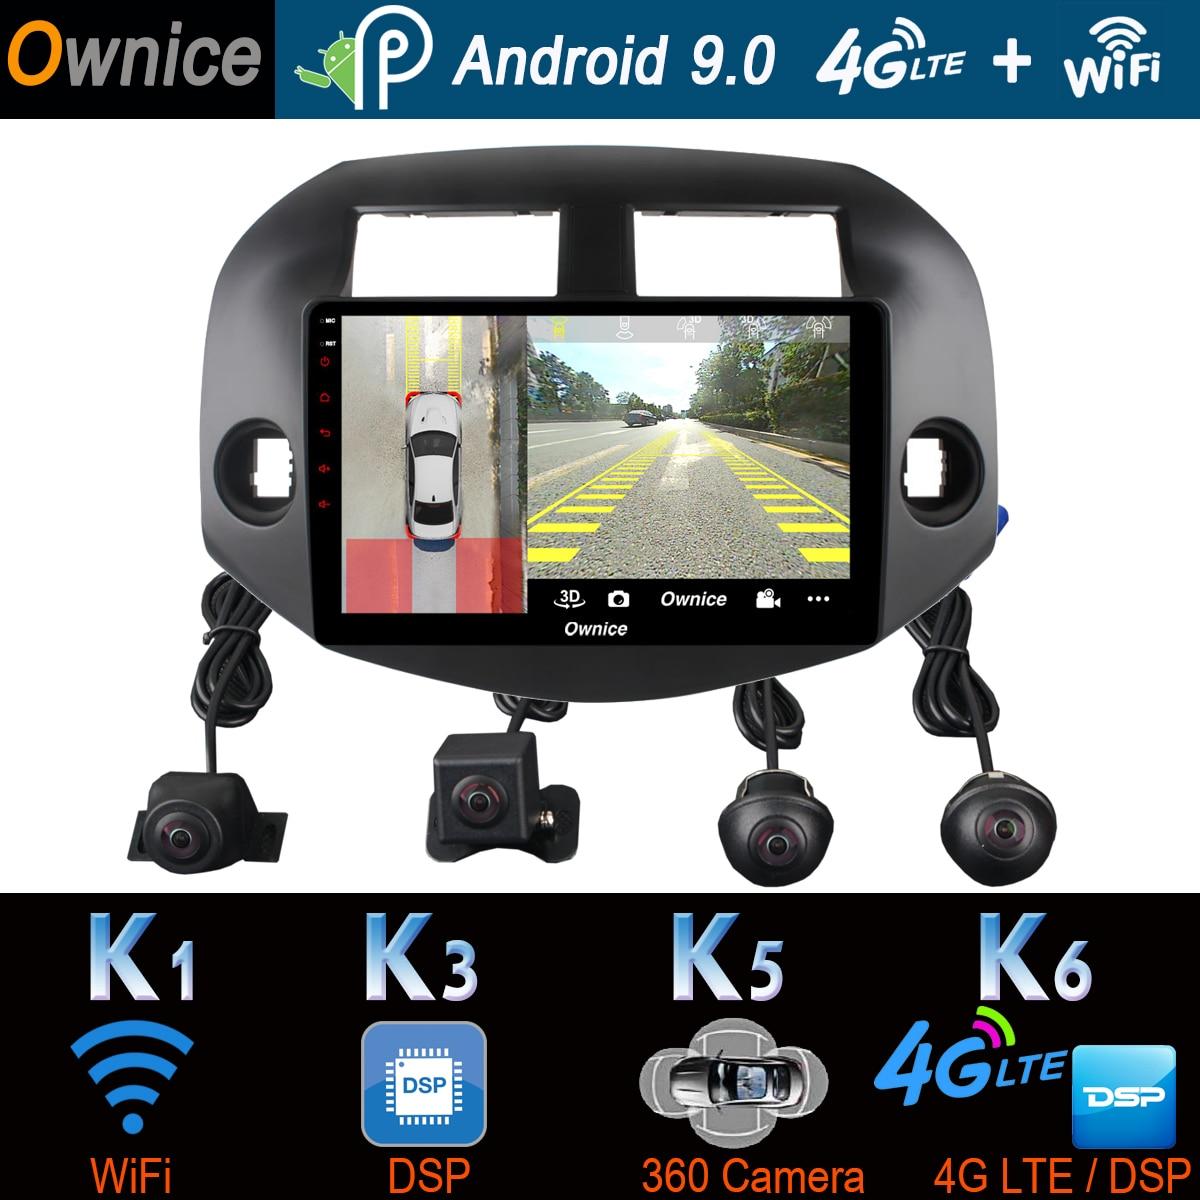 360°Panoramic Android 9.0 4G+64G Car Multimedia Player For Toyota RAV4 RAV 4 2008 2009 2010 2011 2012 2013 GPS Radio CarPlay DSP Car Multimedia Player    - AliExpress